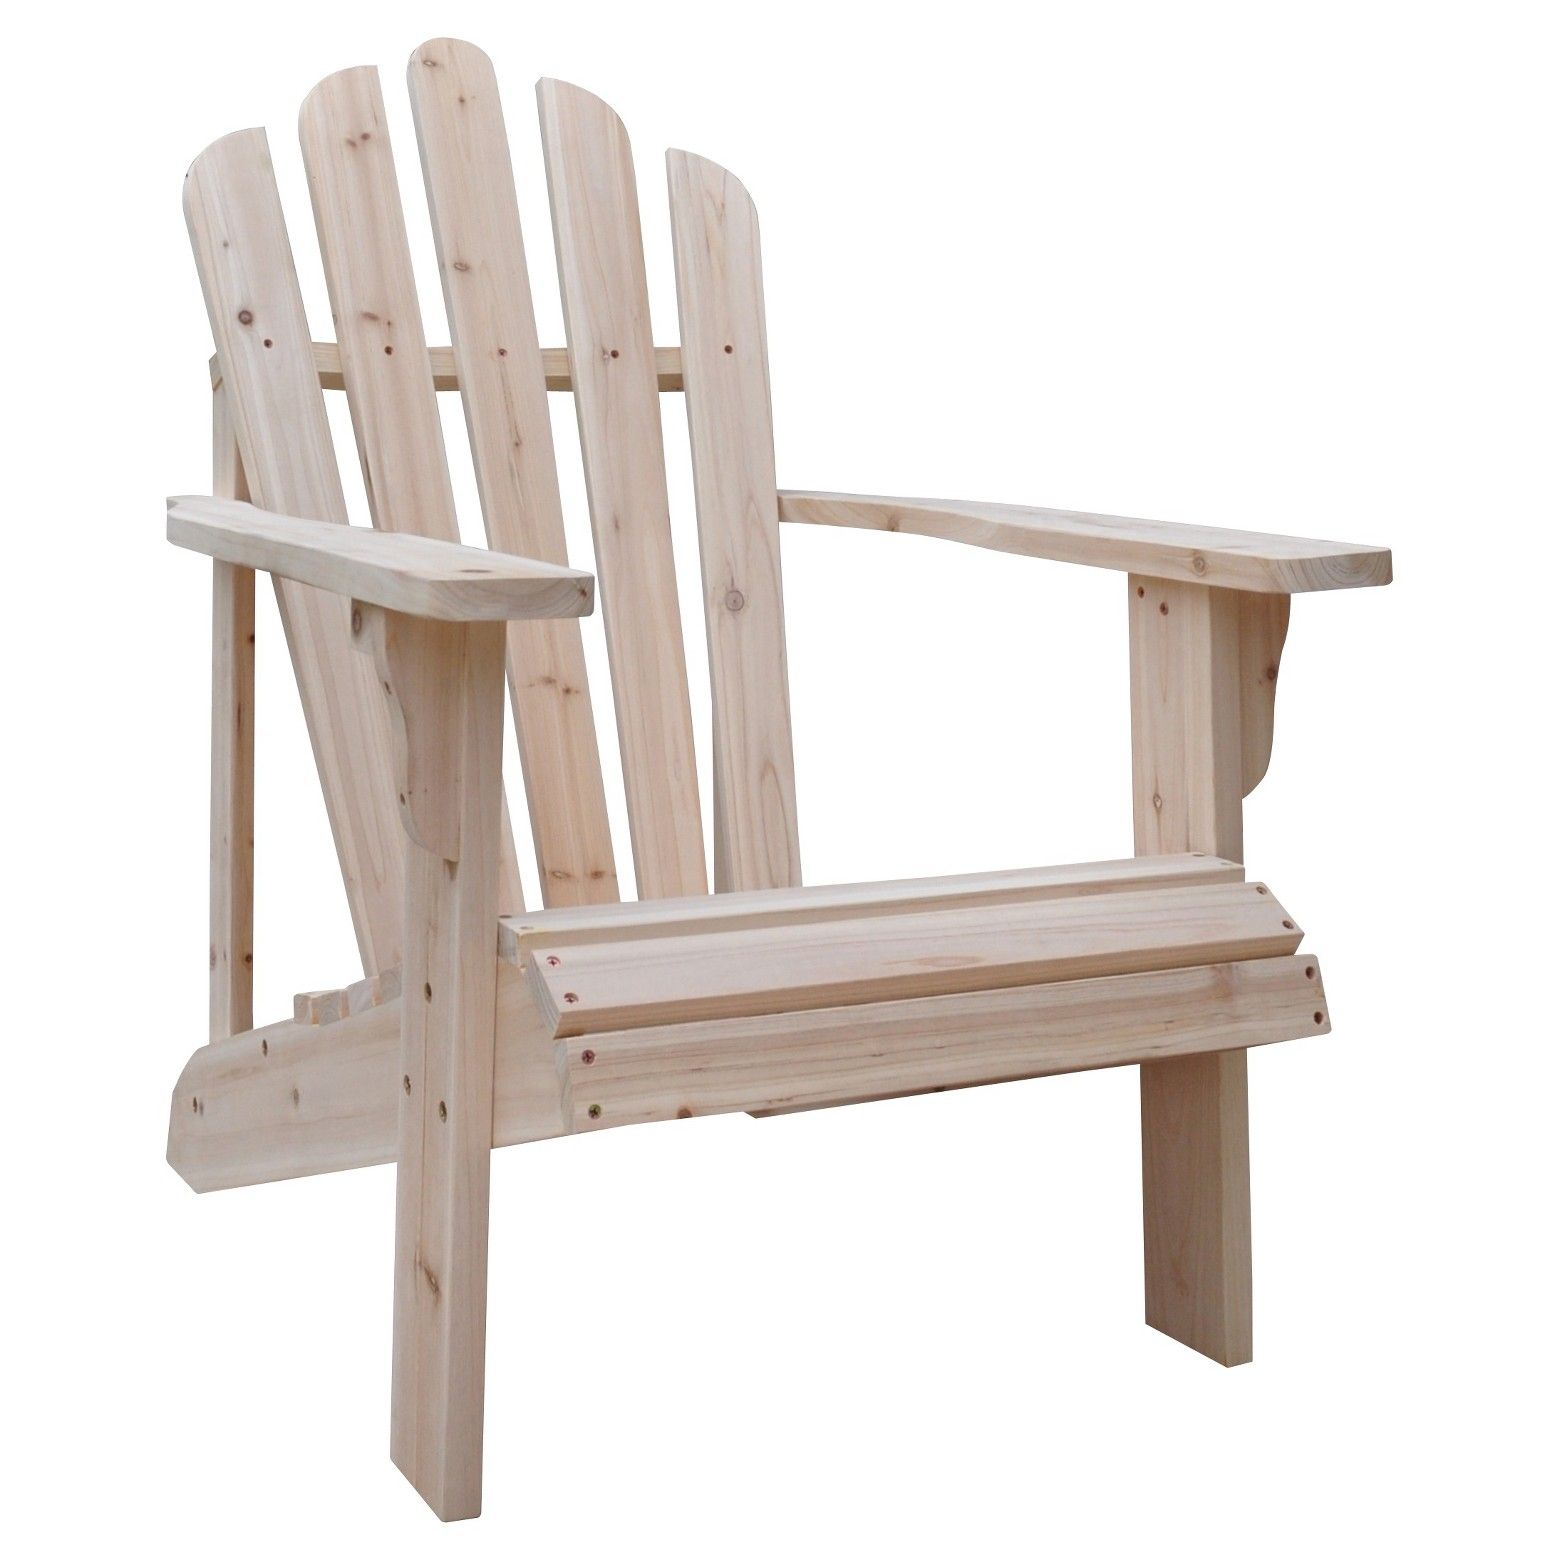 Shine Company Adirondack Chair Adirondack chair, Patio